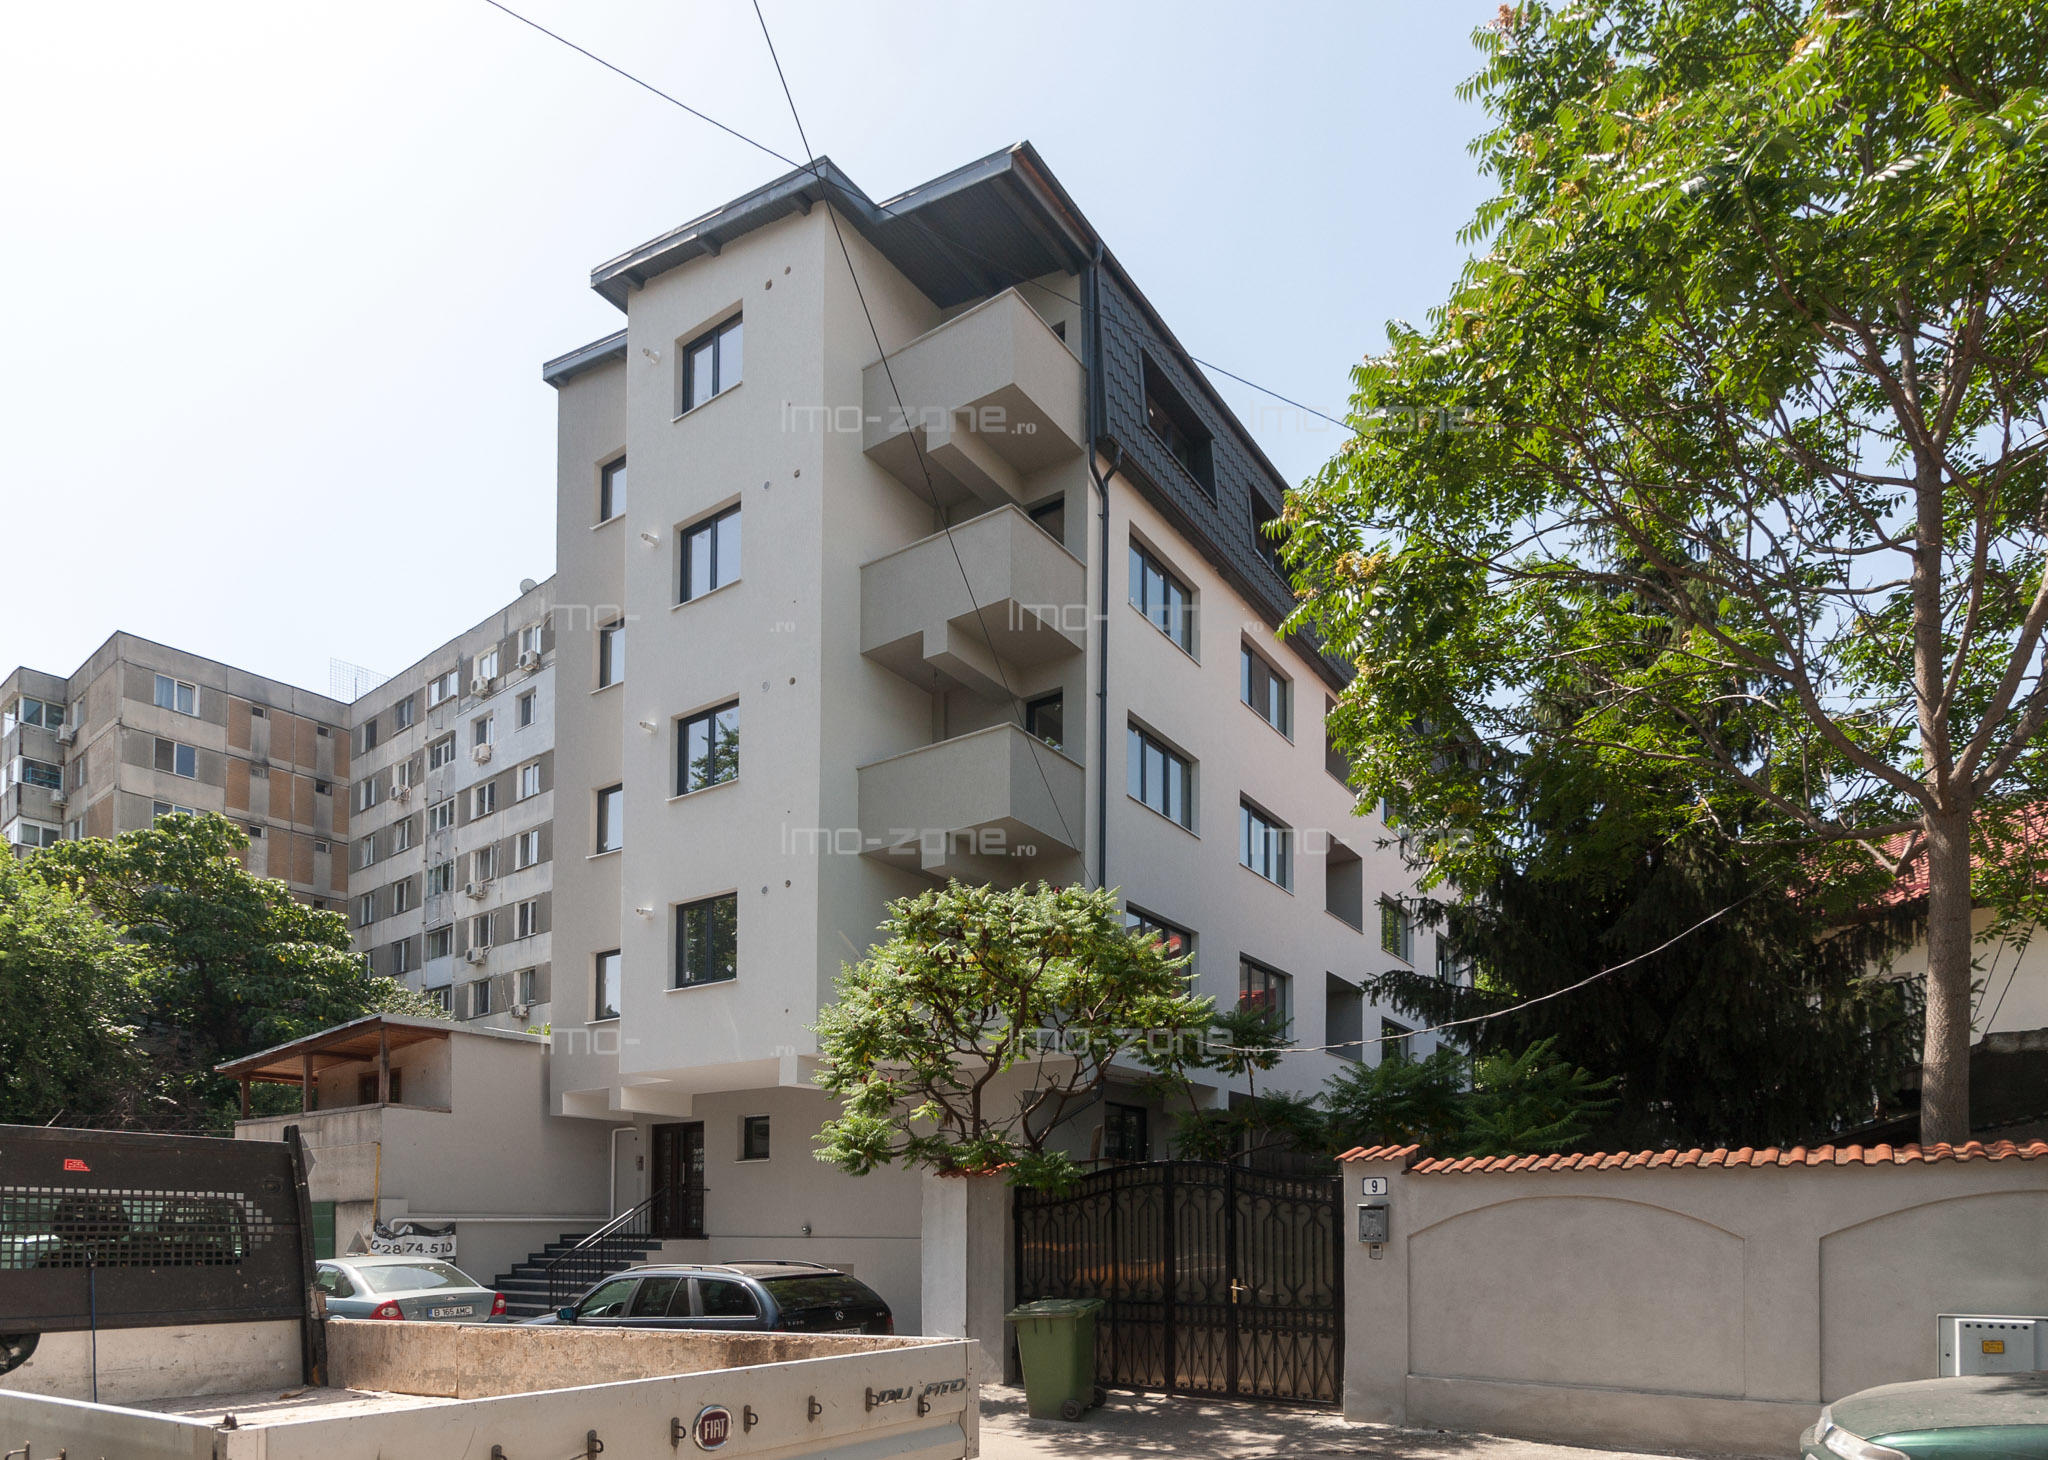 InTown Residence - Azurului 7